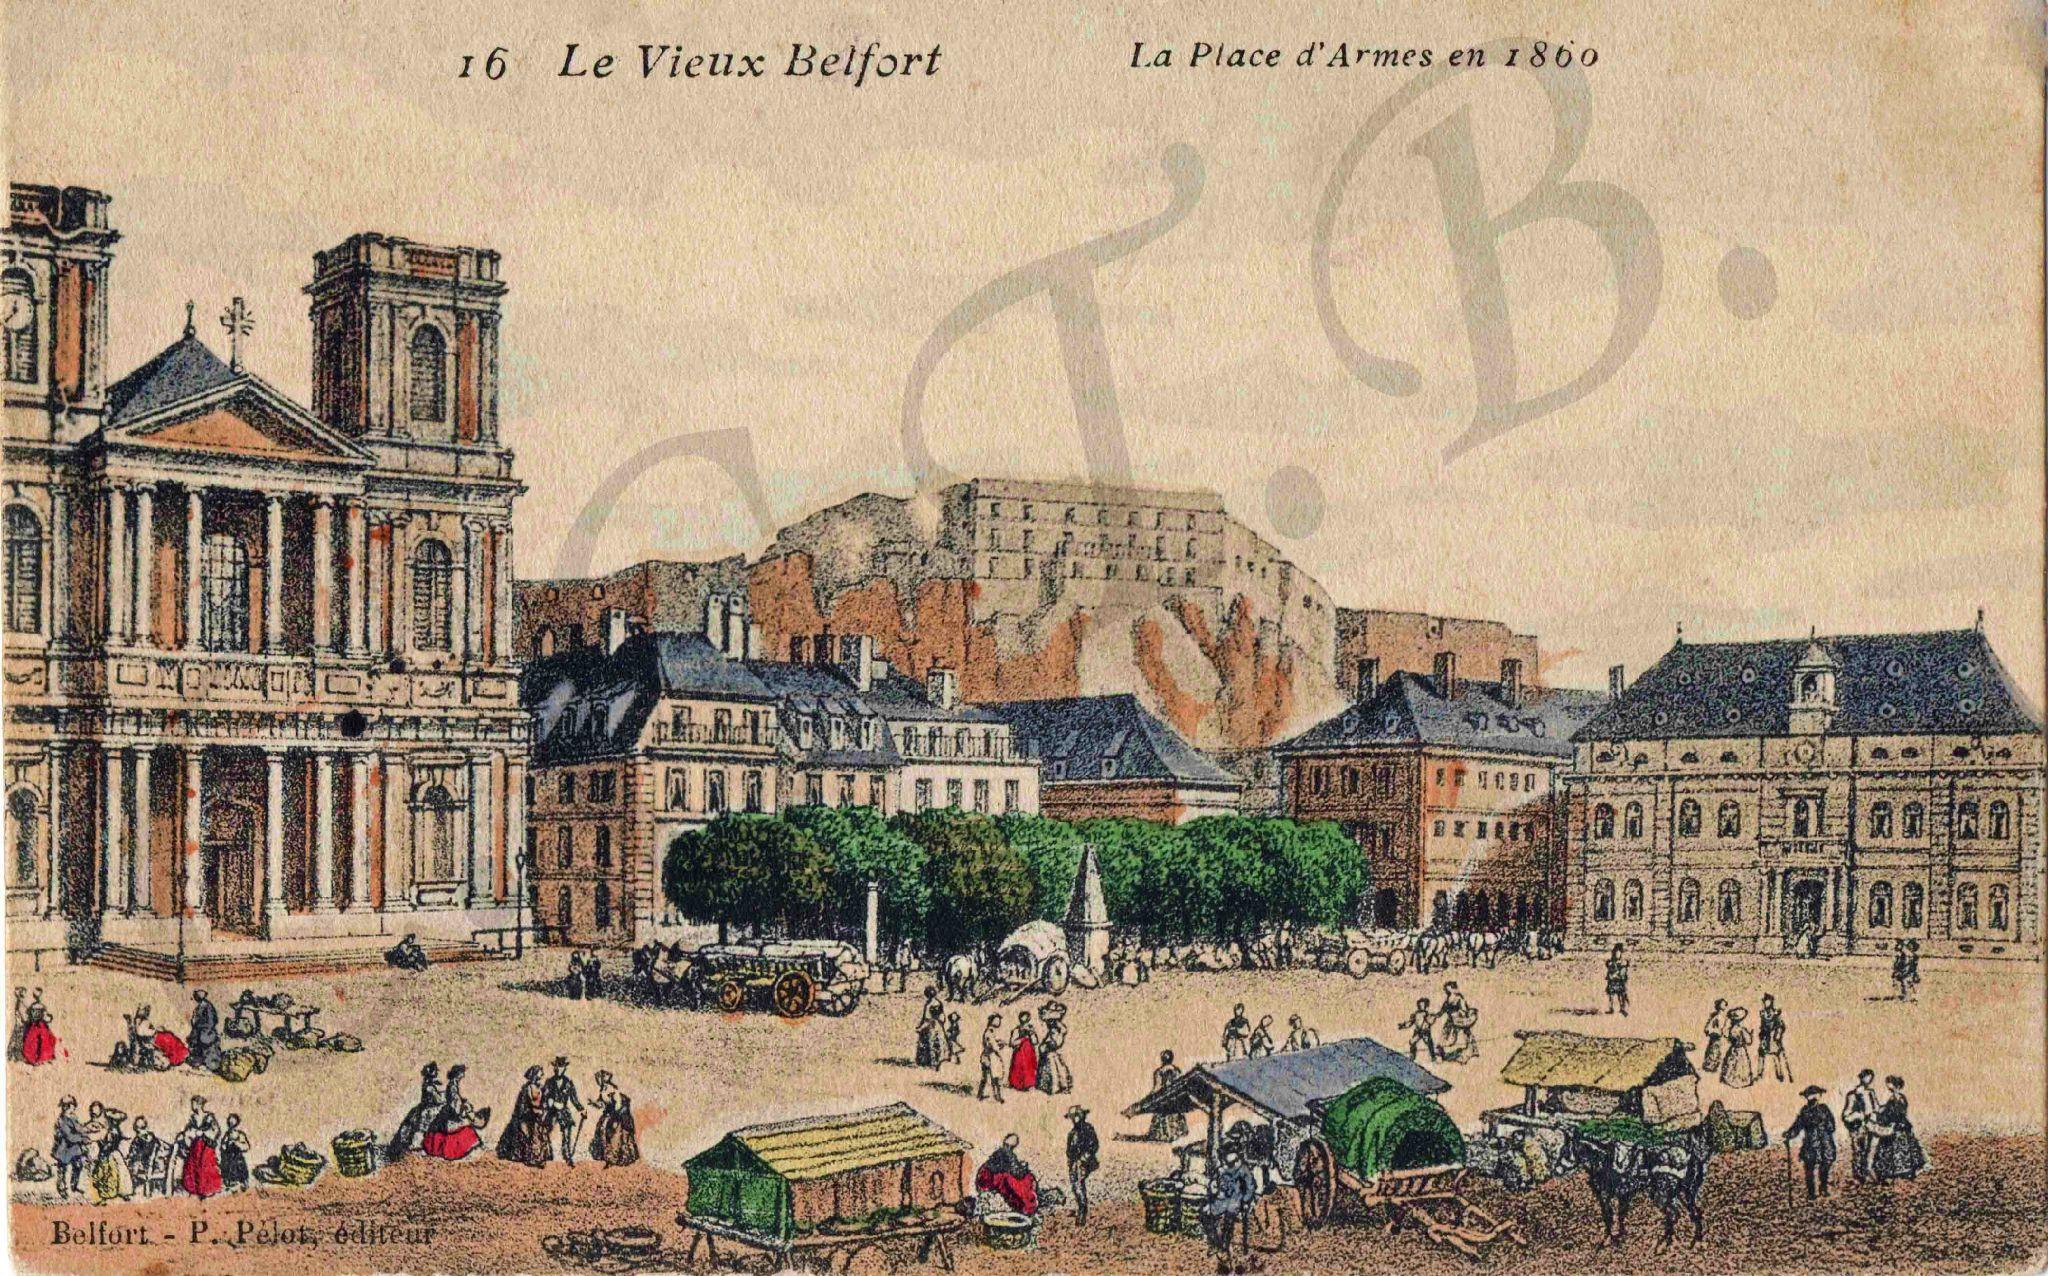 Les squares de Belfort (Episode initial) : Les origines des squares